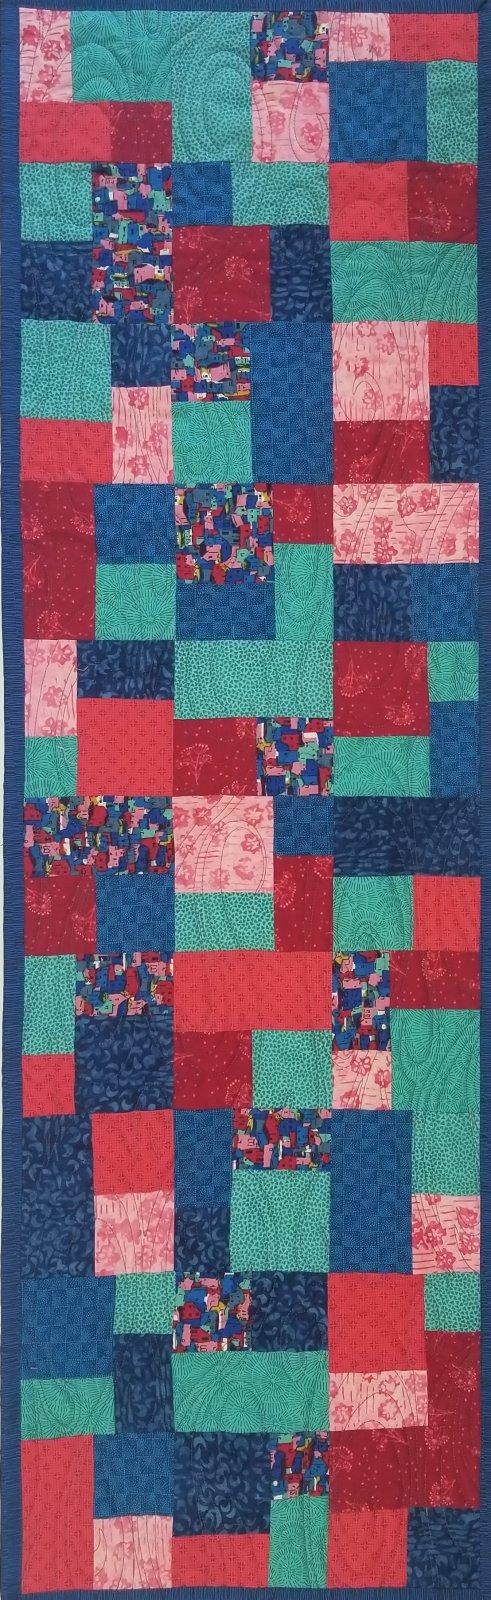 City Scape Mini Brick Road Fabric Kit